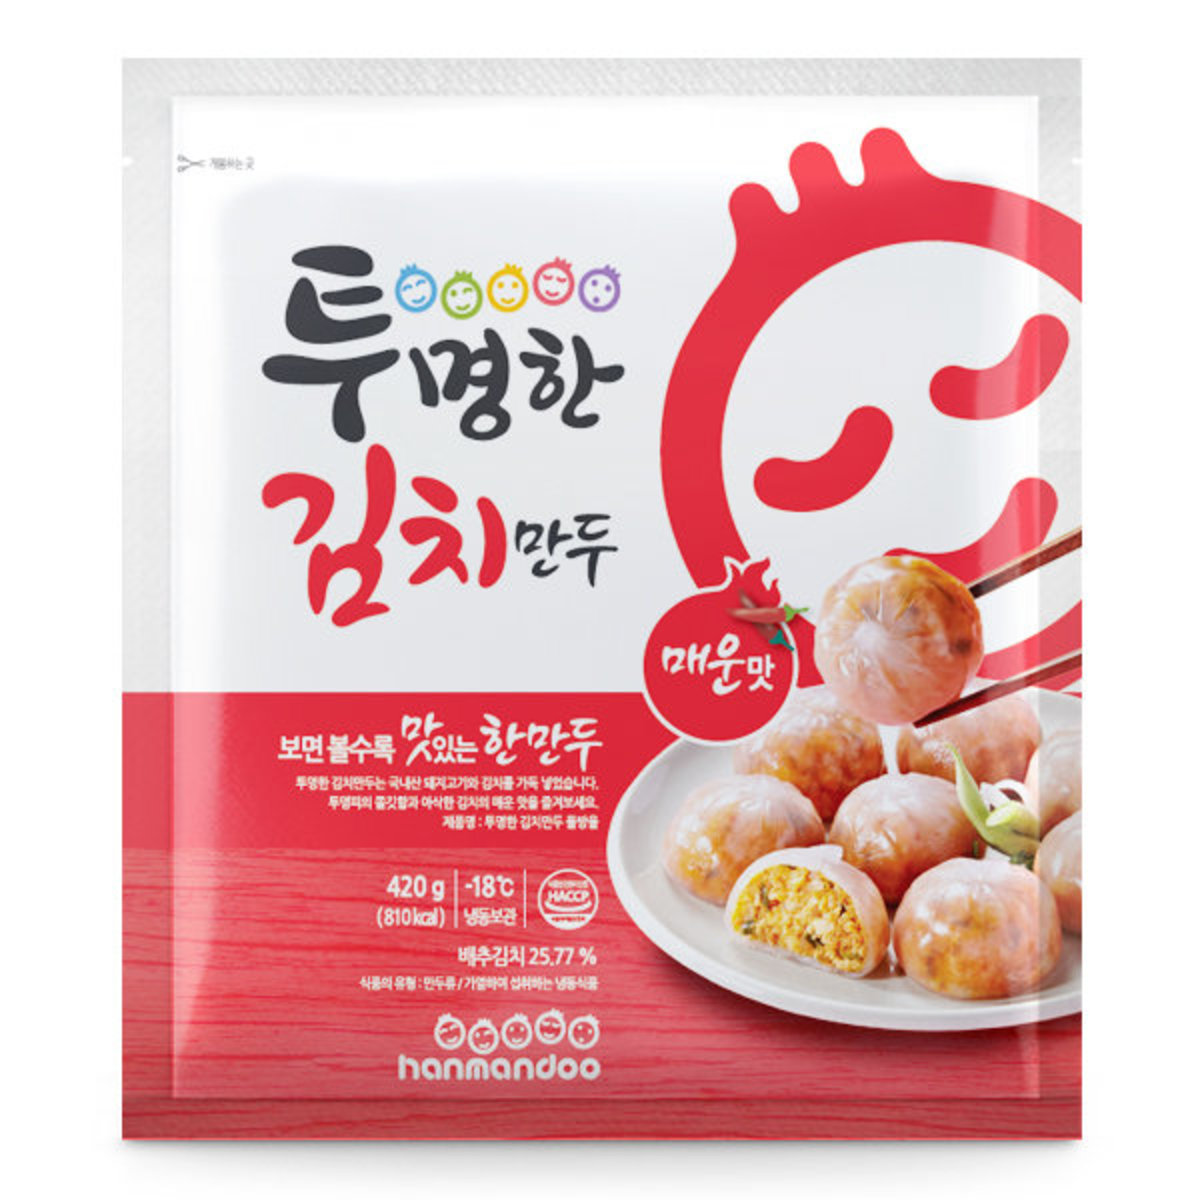 Crystal Skin Kimchi Waterdrop Dumpling 水晶泡菜小籠包(420g)